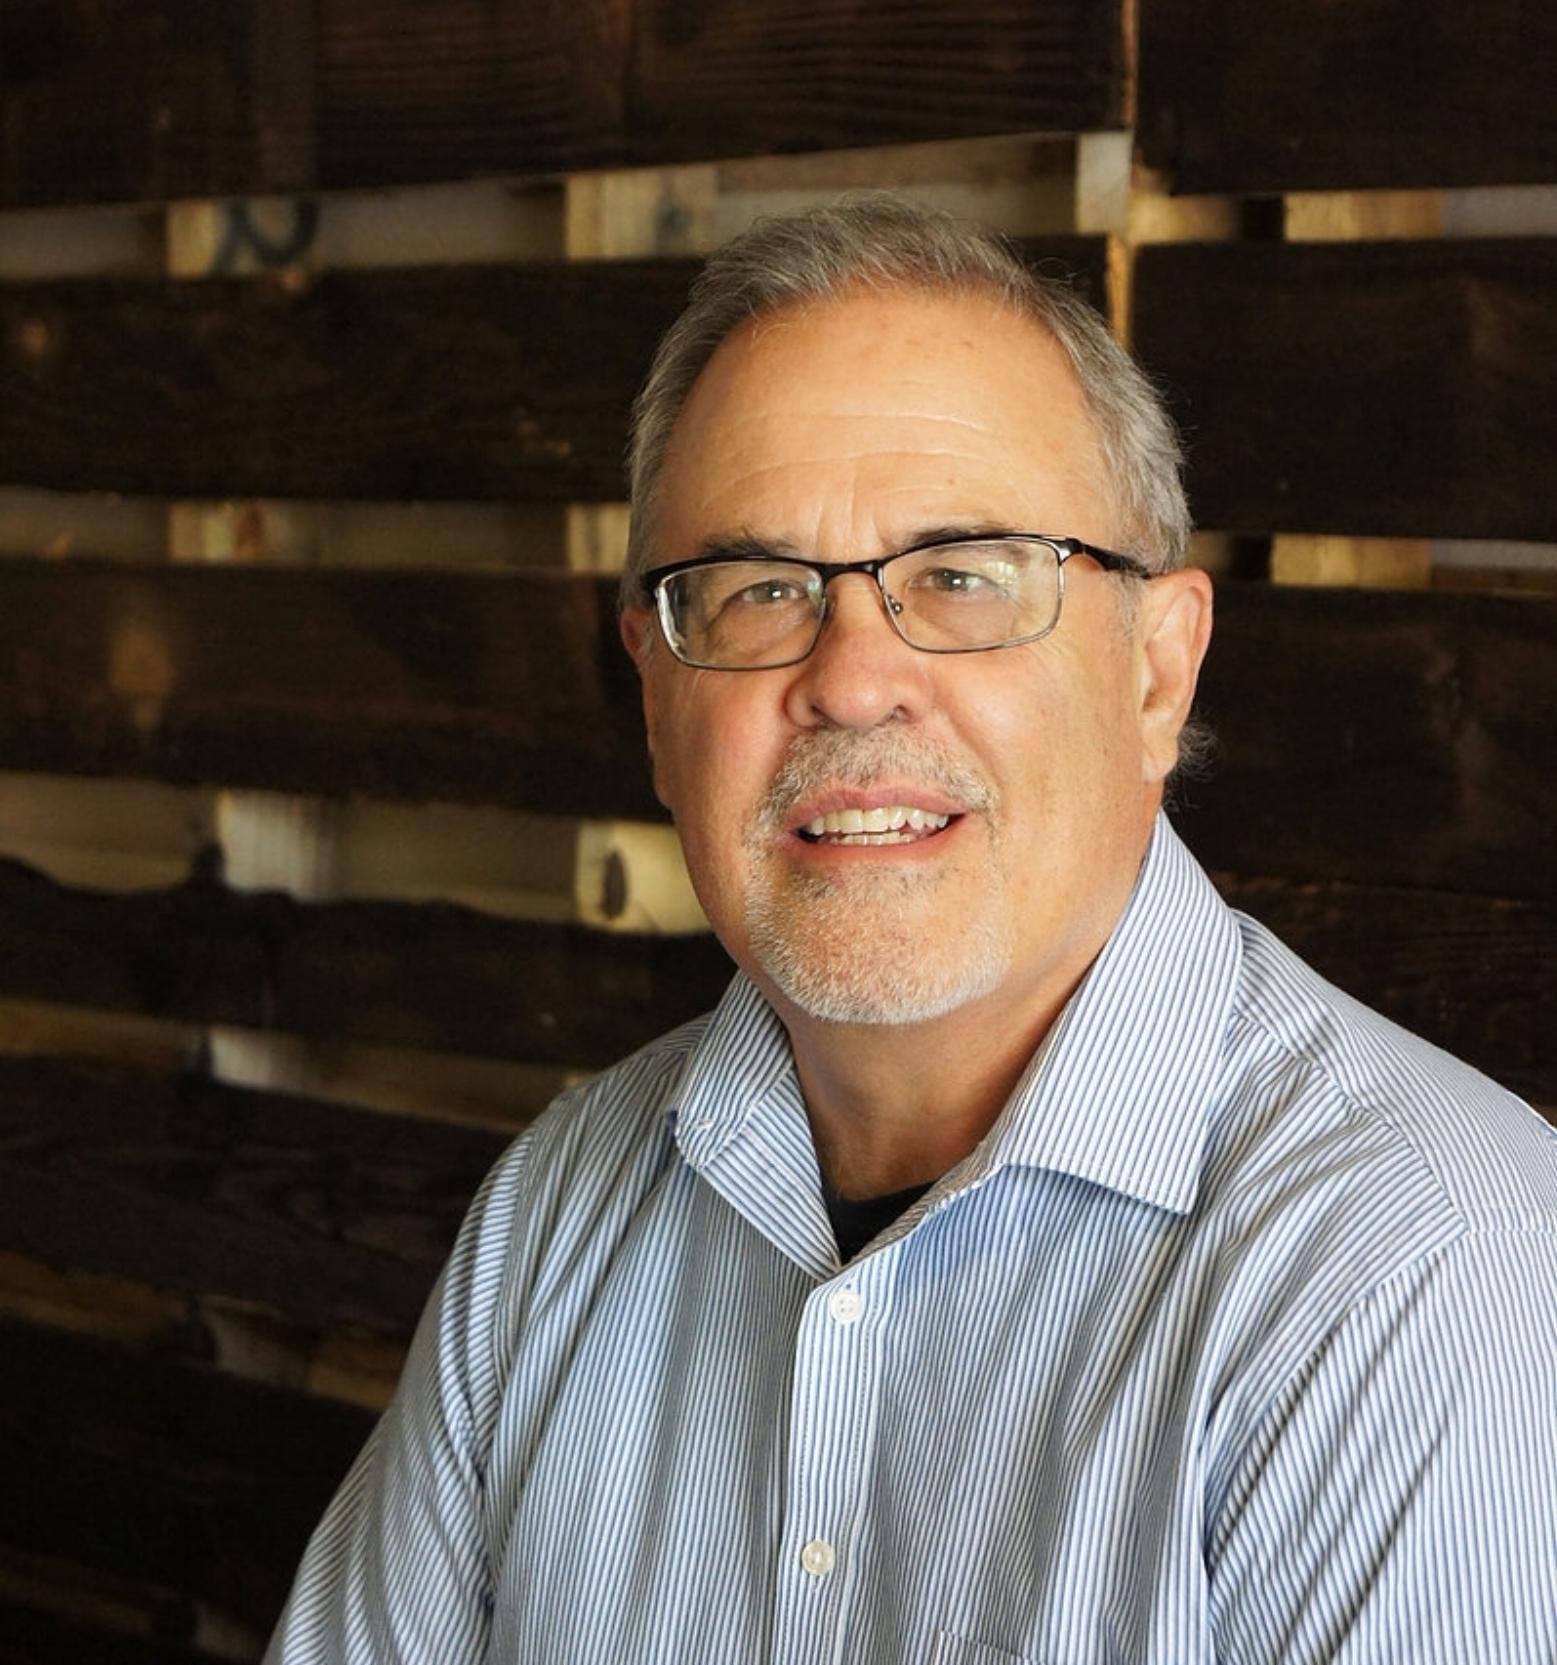 Doug Tawlks -   M.A. Counseling, Director the LifeBridge